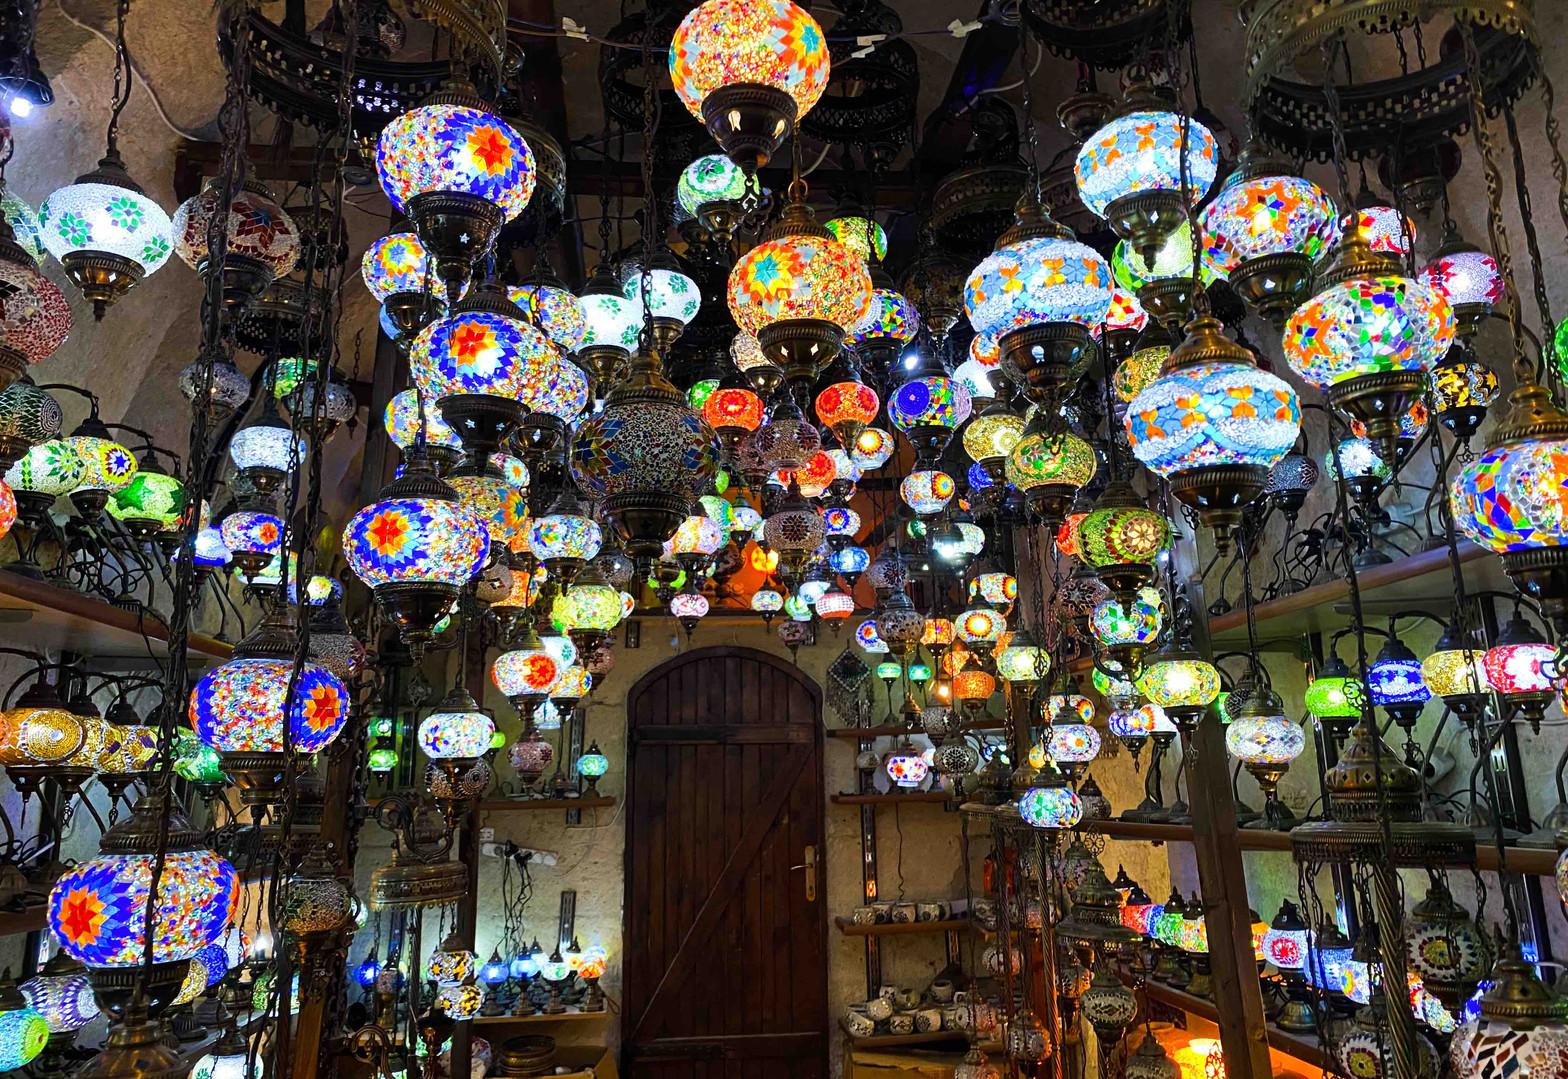 bigstock-Colorful-Handmade-Turkish-Lamp-